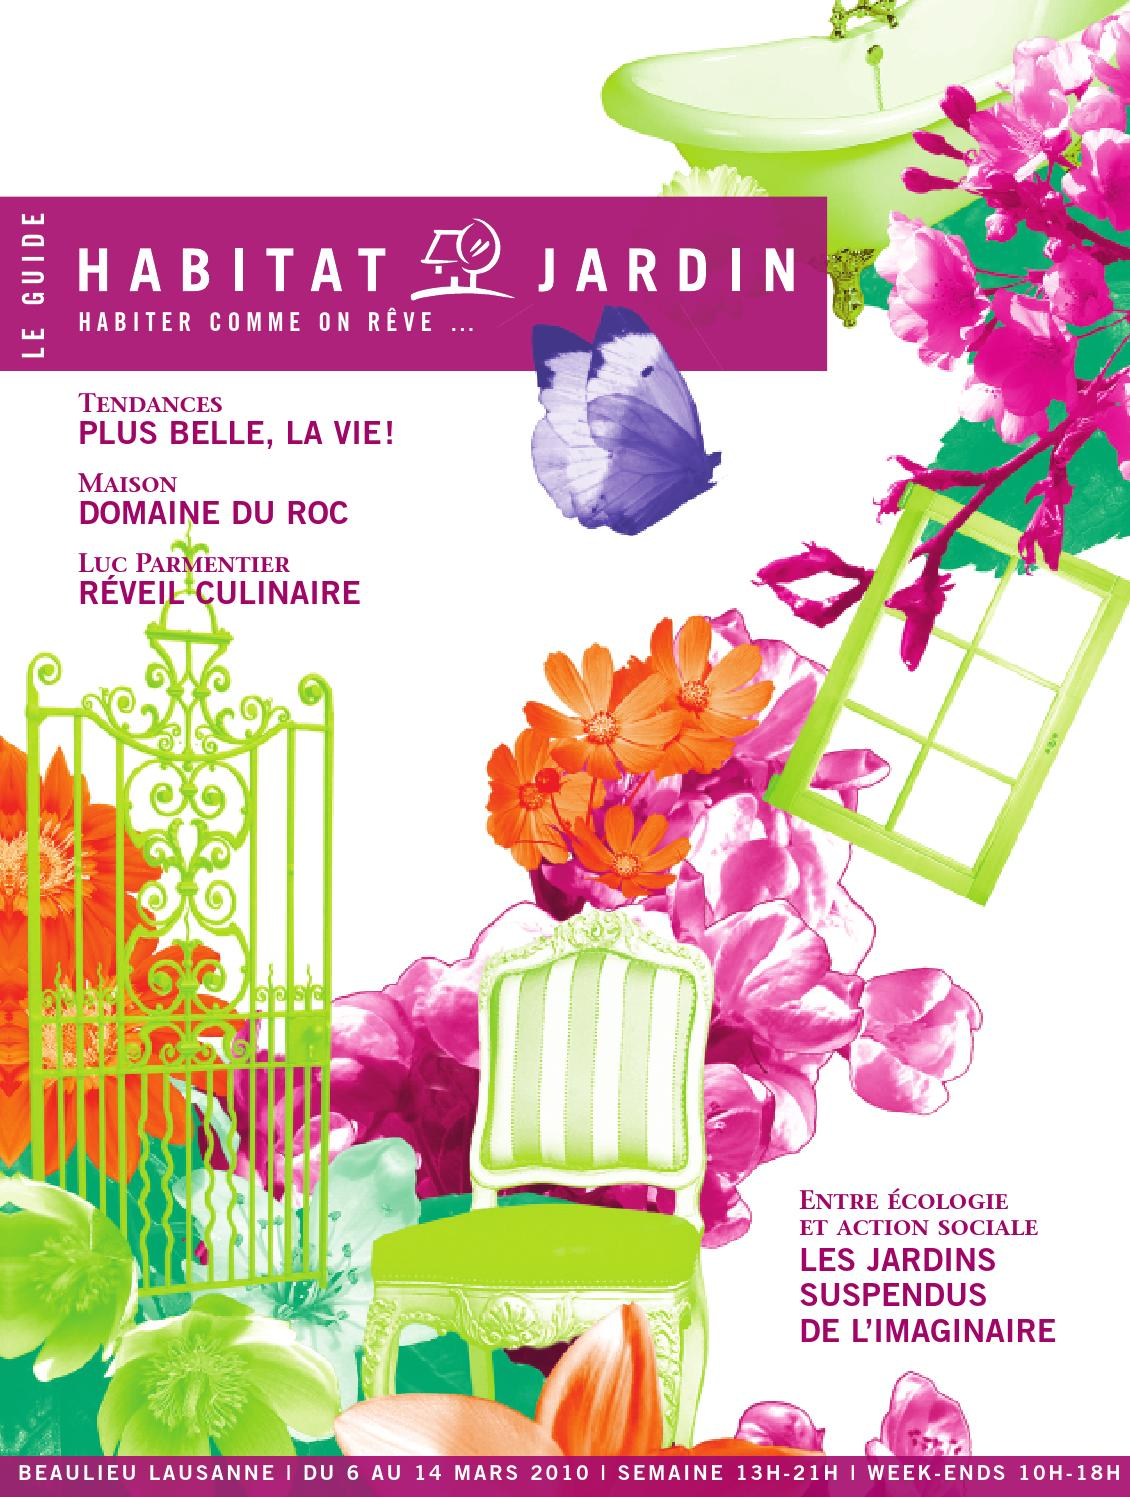 Le Magazine Habitat Jardin By Inedit Publications Sa Issuu